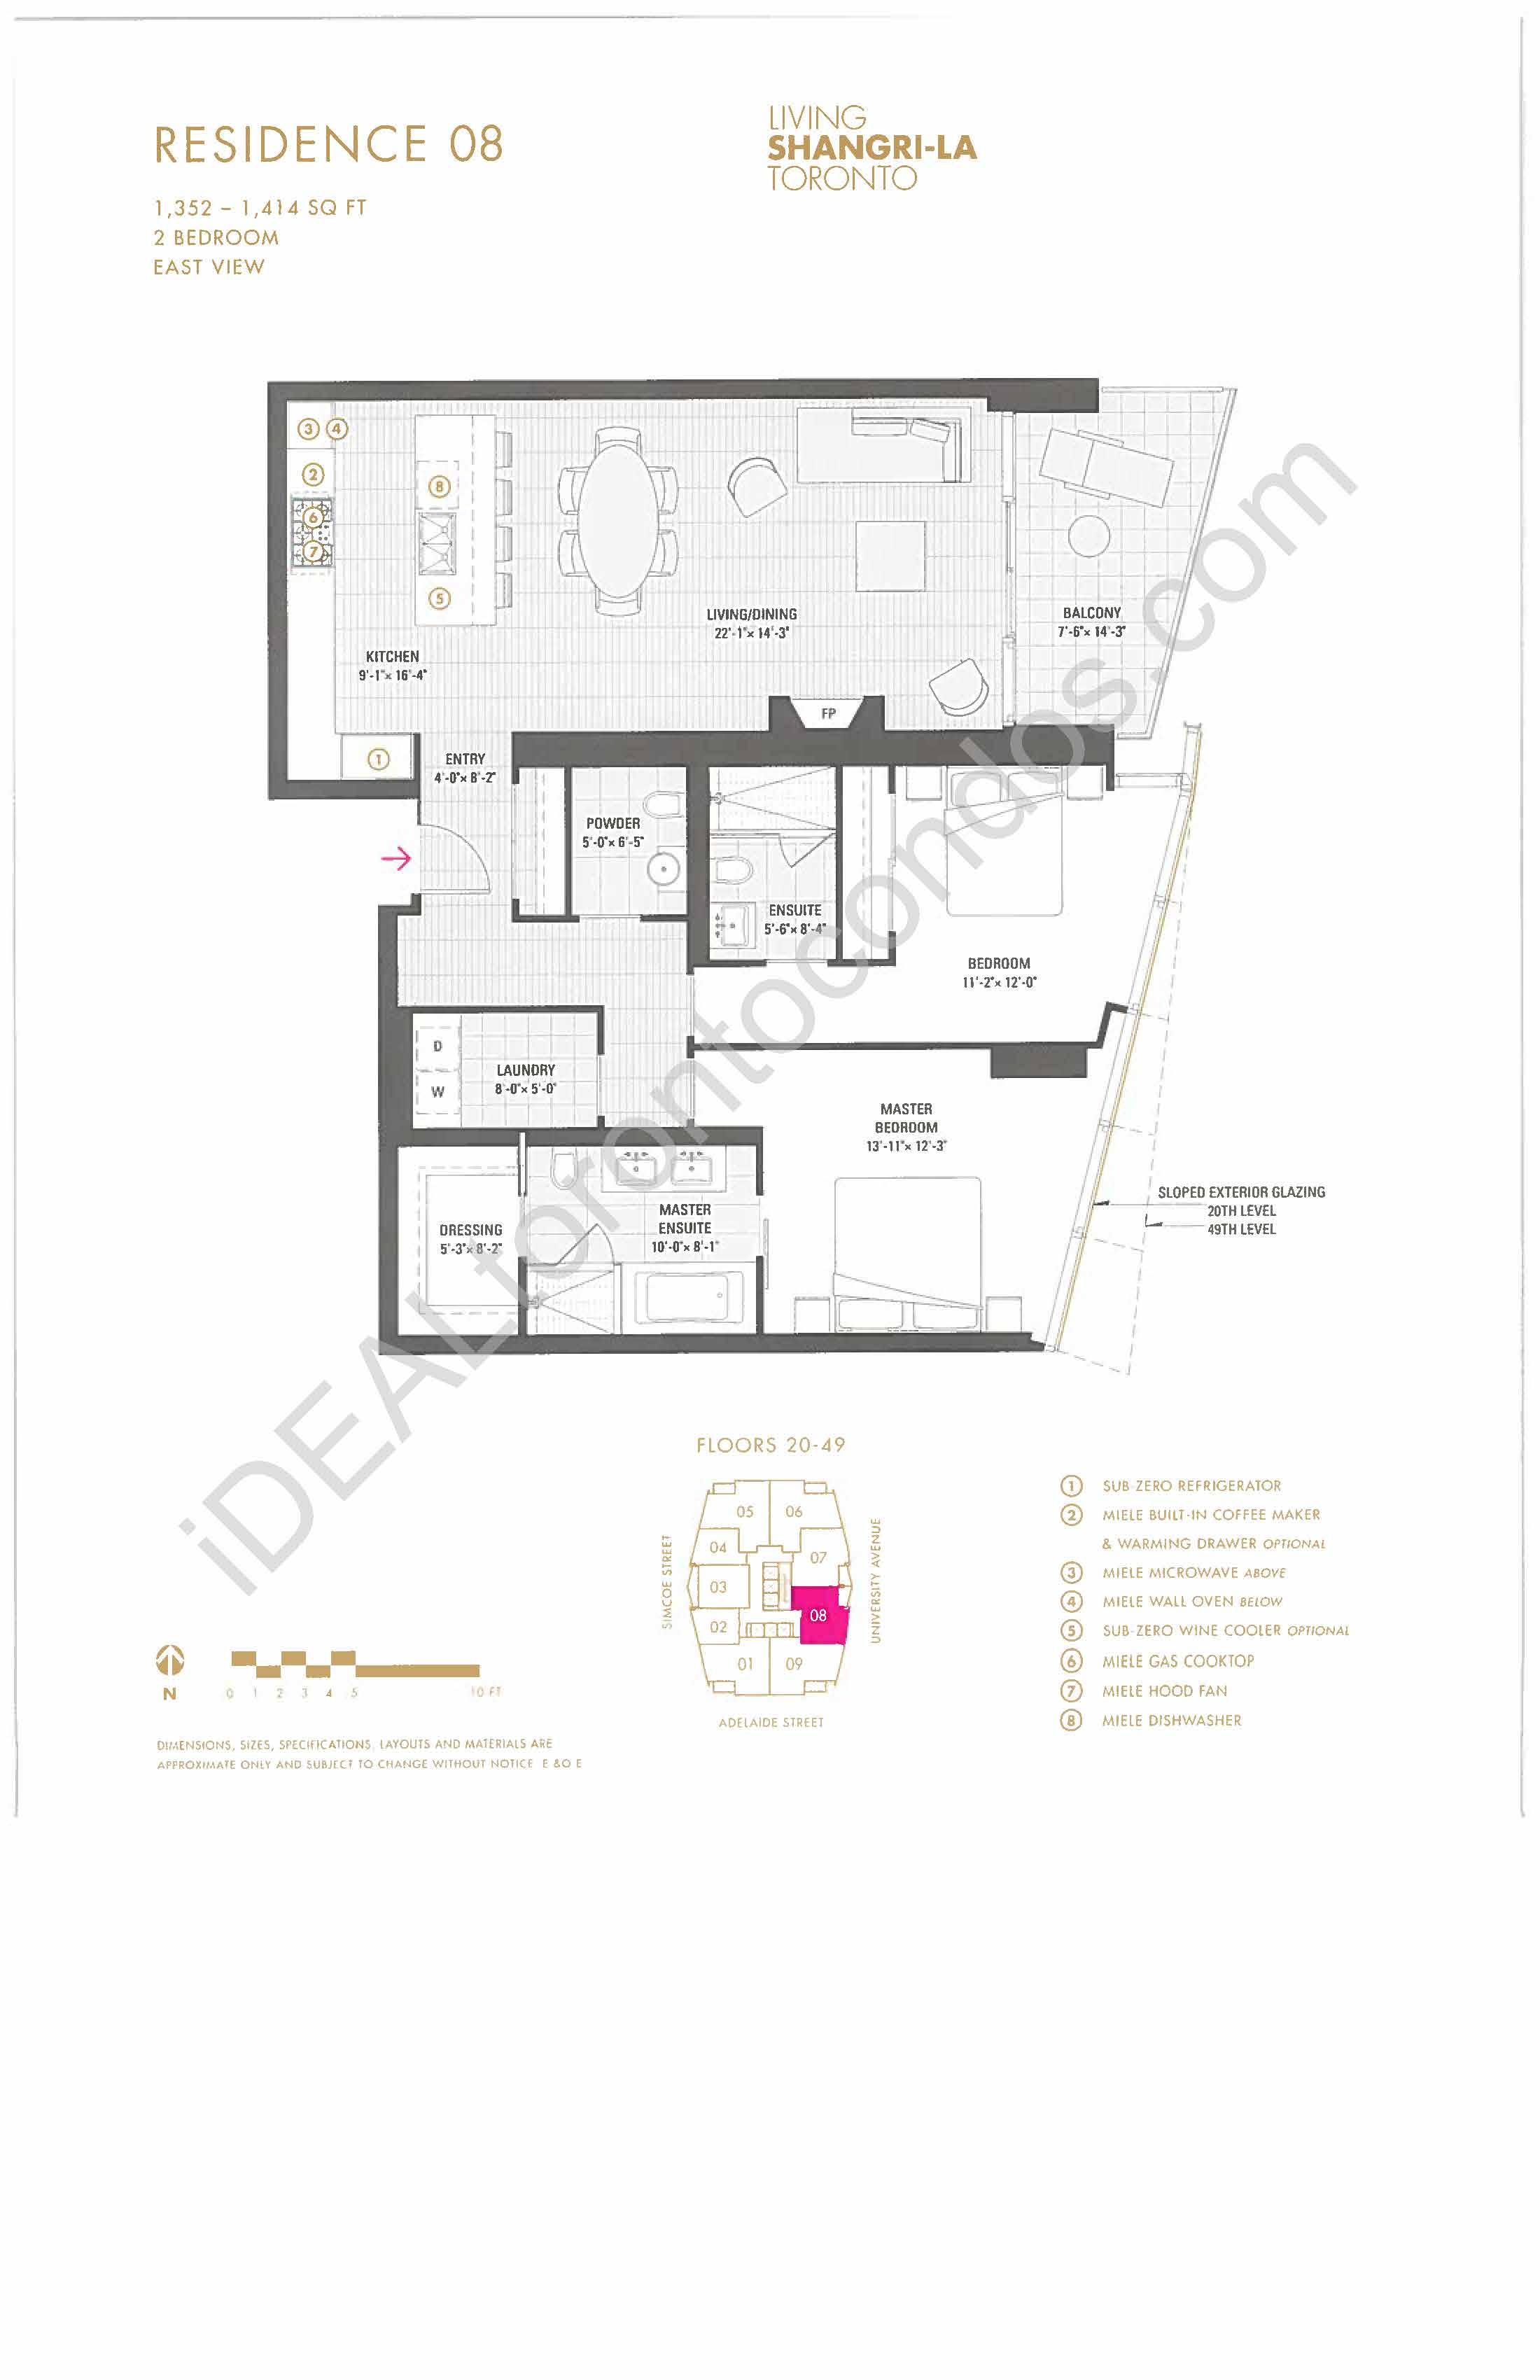 Residence 08 - 2 Bedroom